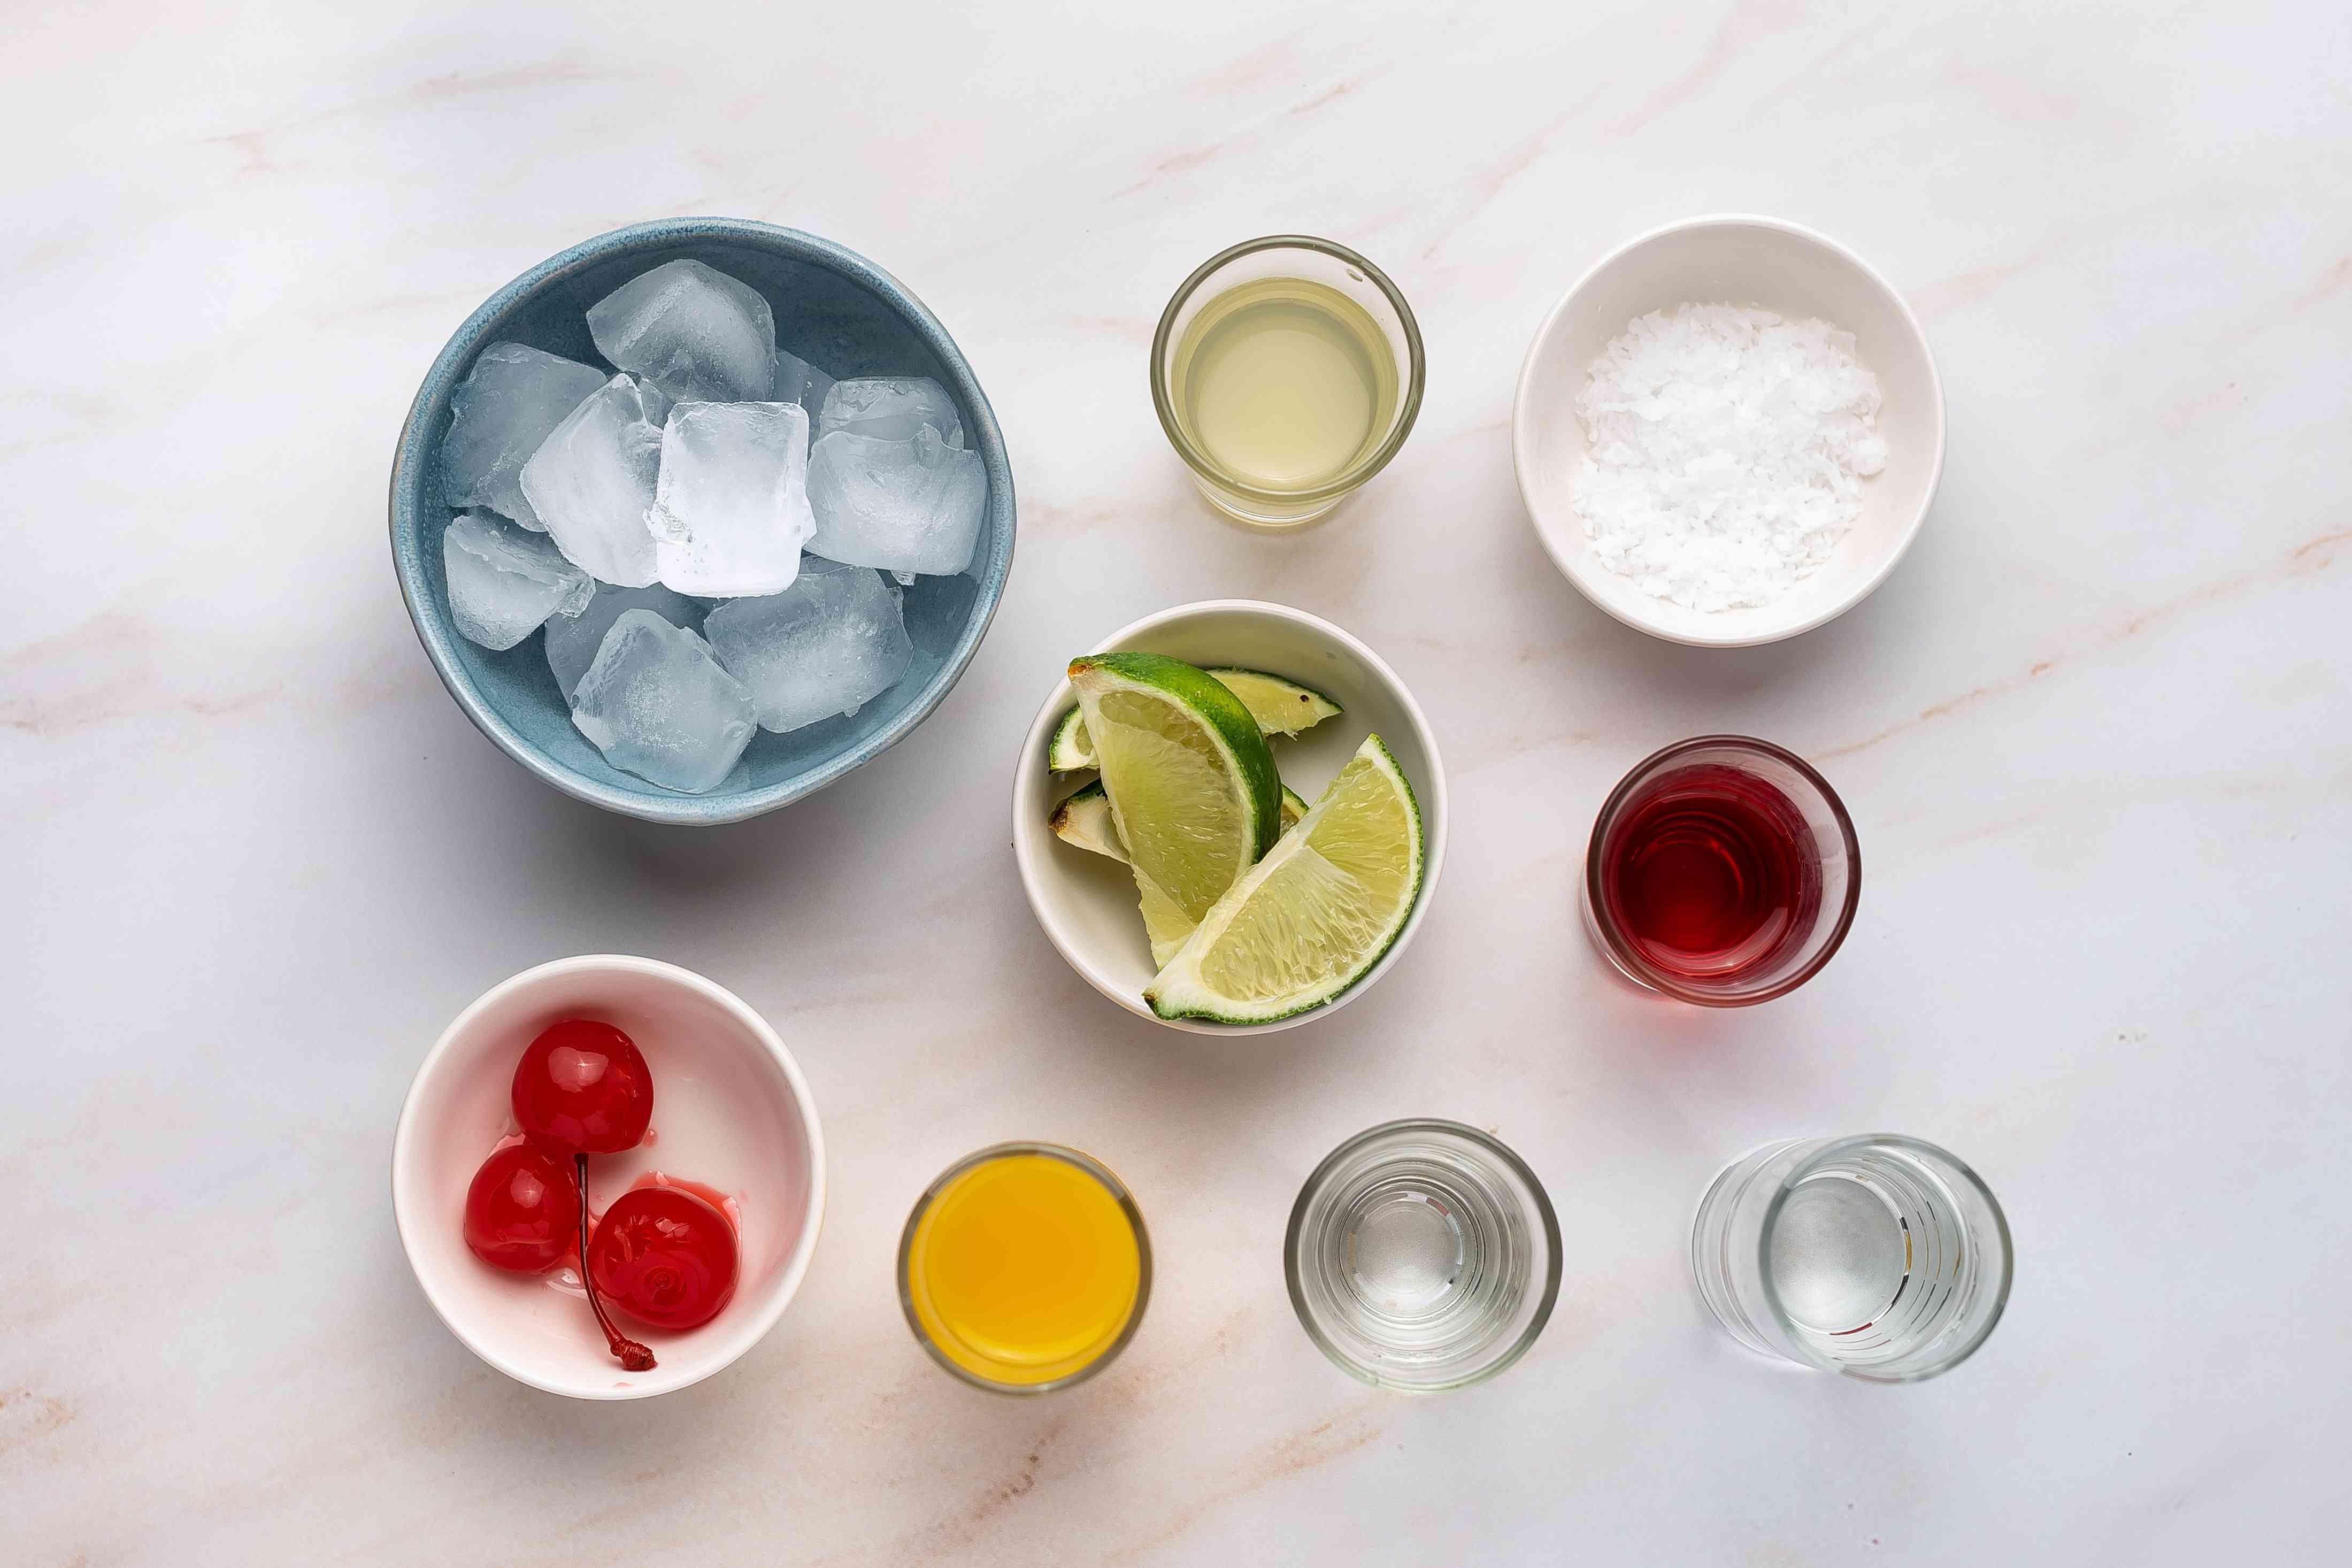 Frozen Tequila Sunrise Margarita ingredients